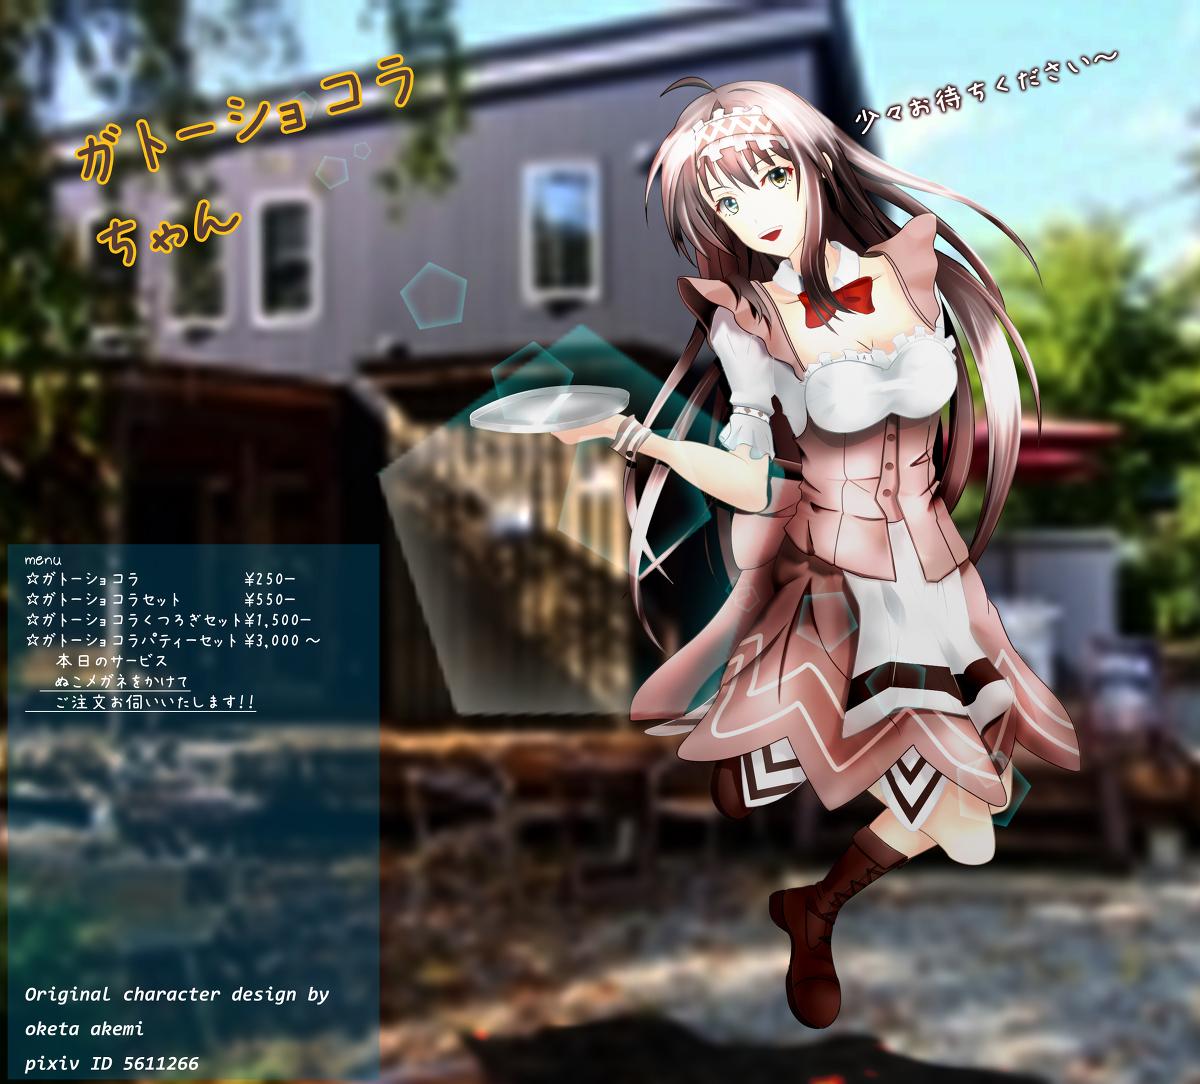 50029727_p0_master1200.jpg